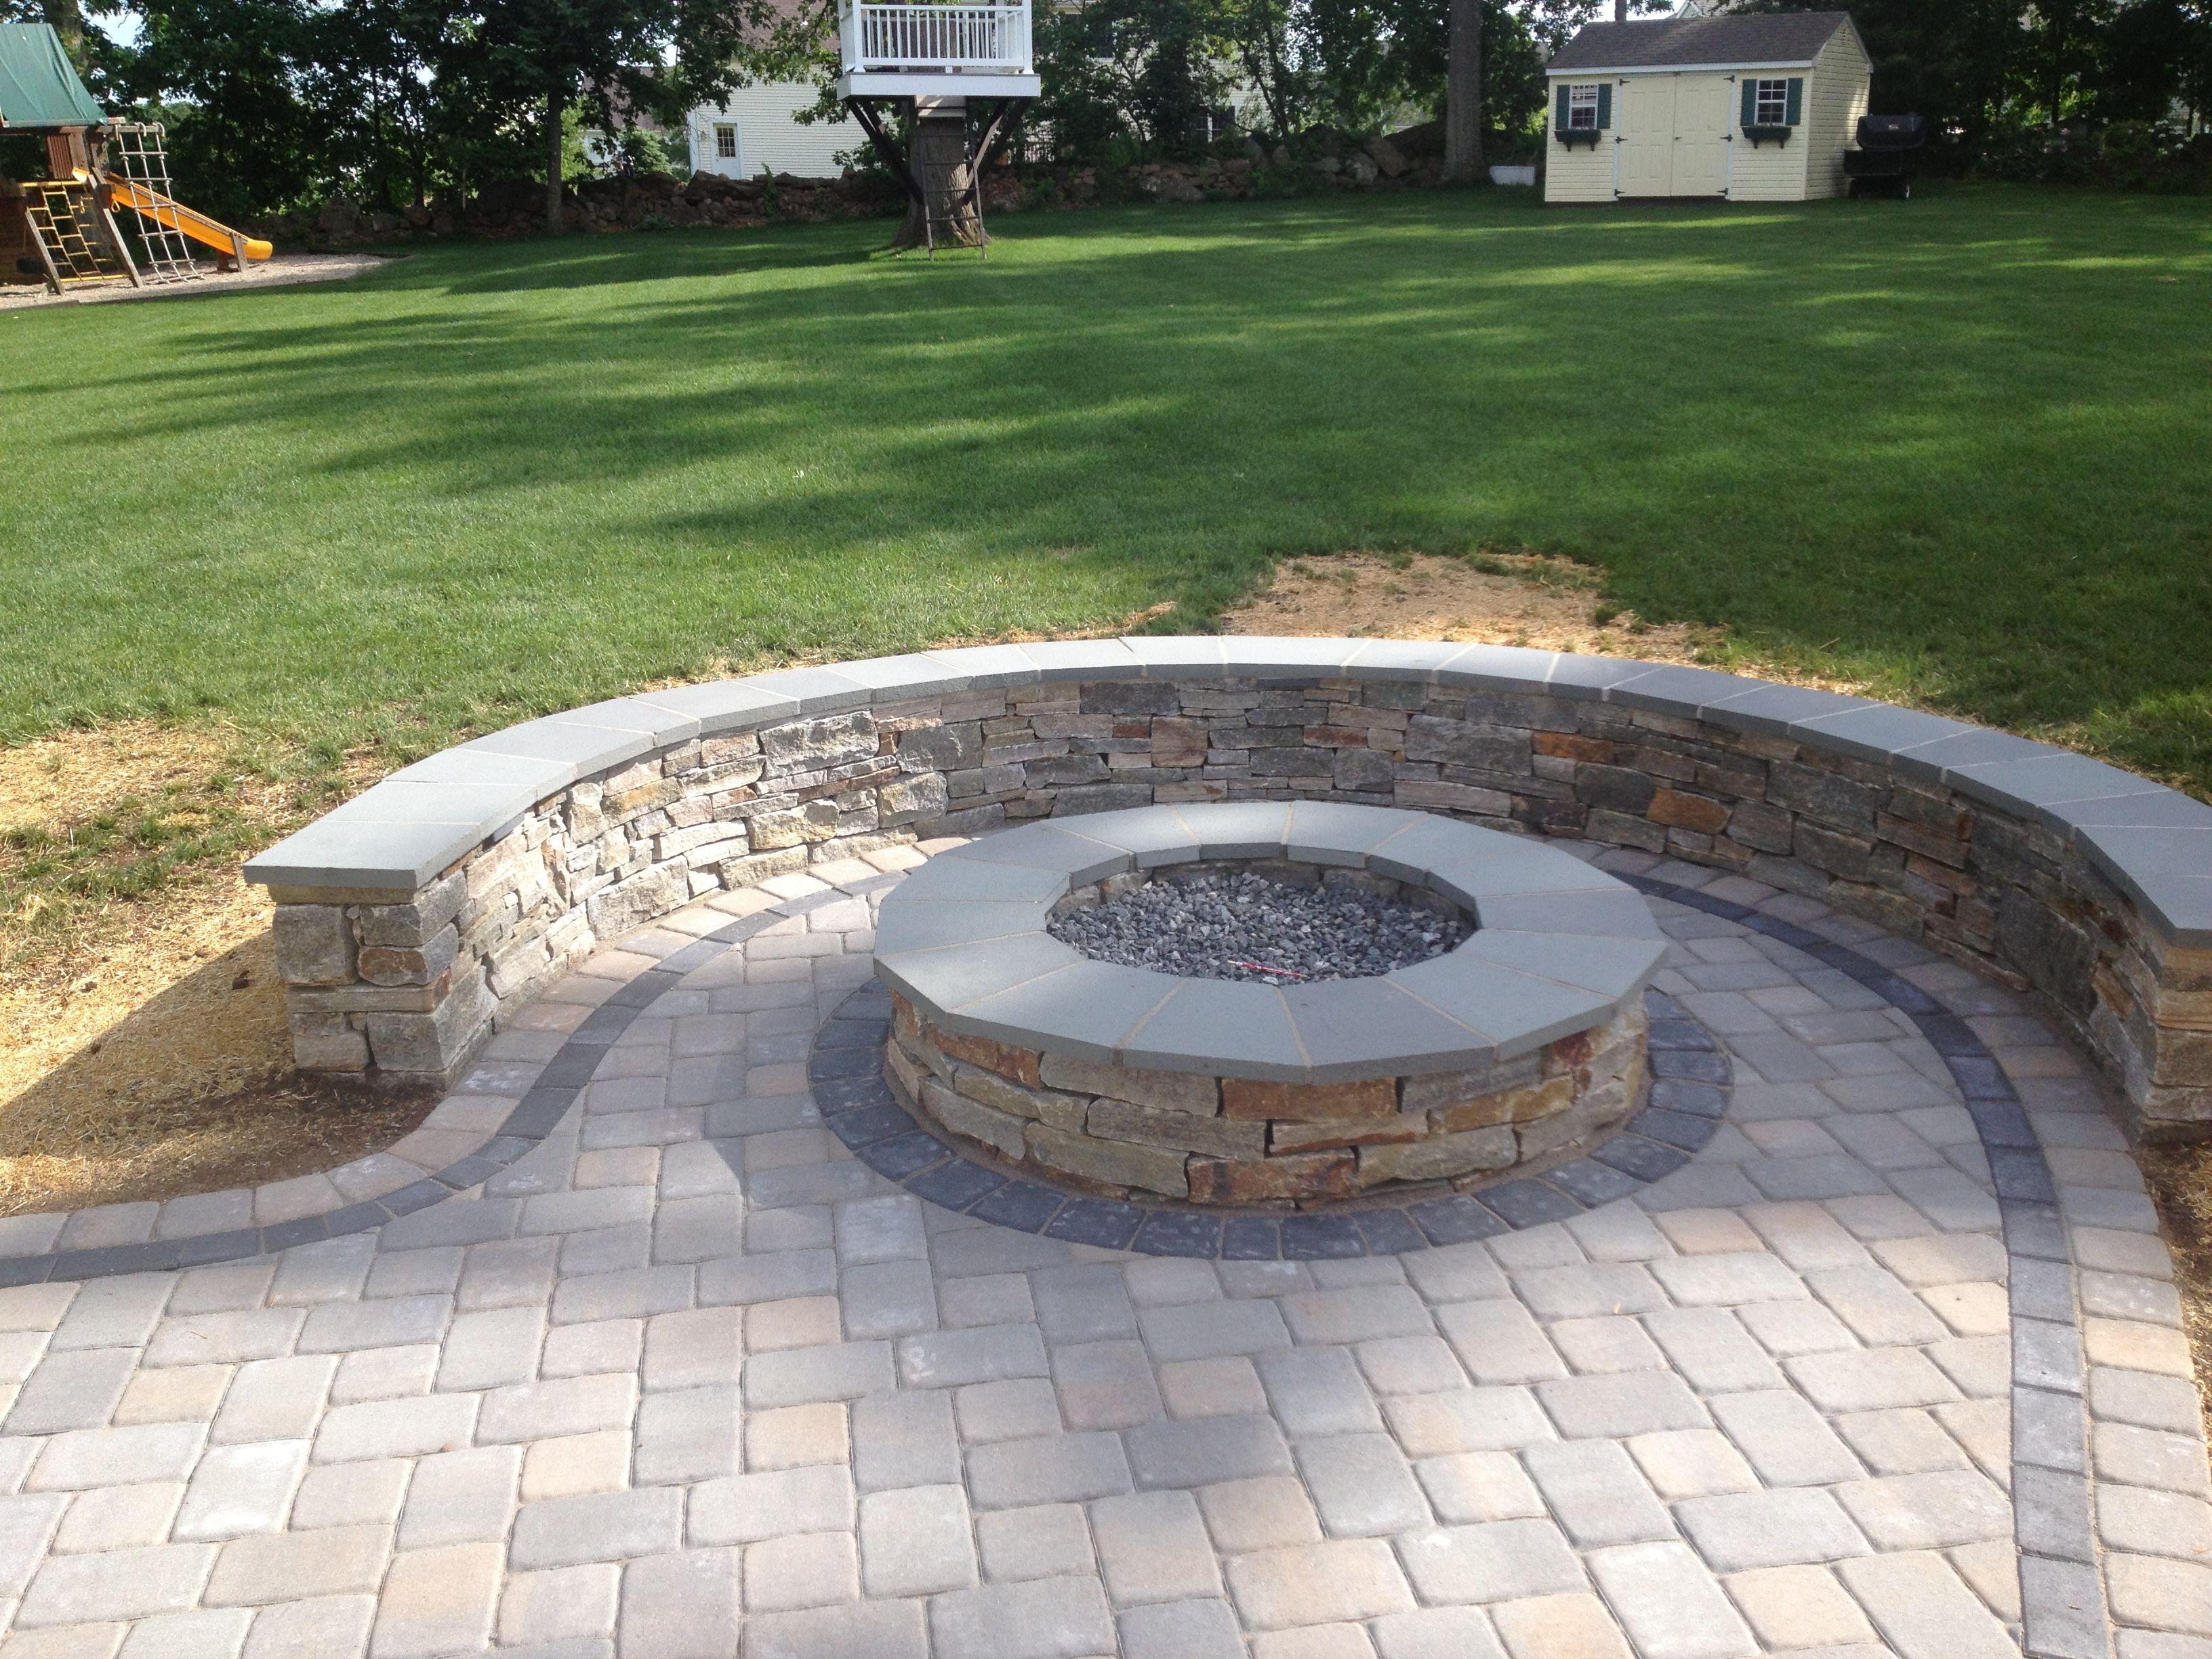 Paver Patio Ideas 86   Stone patio designs, Brick patterns ... on Paver Patio With Fire Pit Ideas id=65439